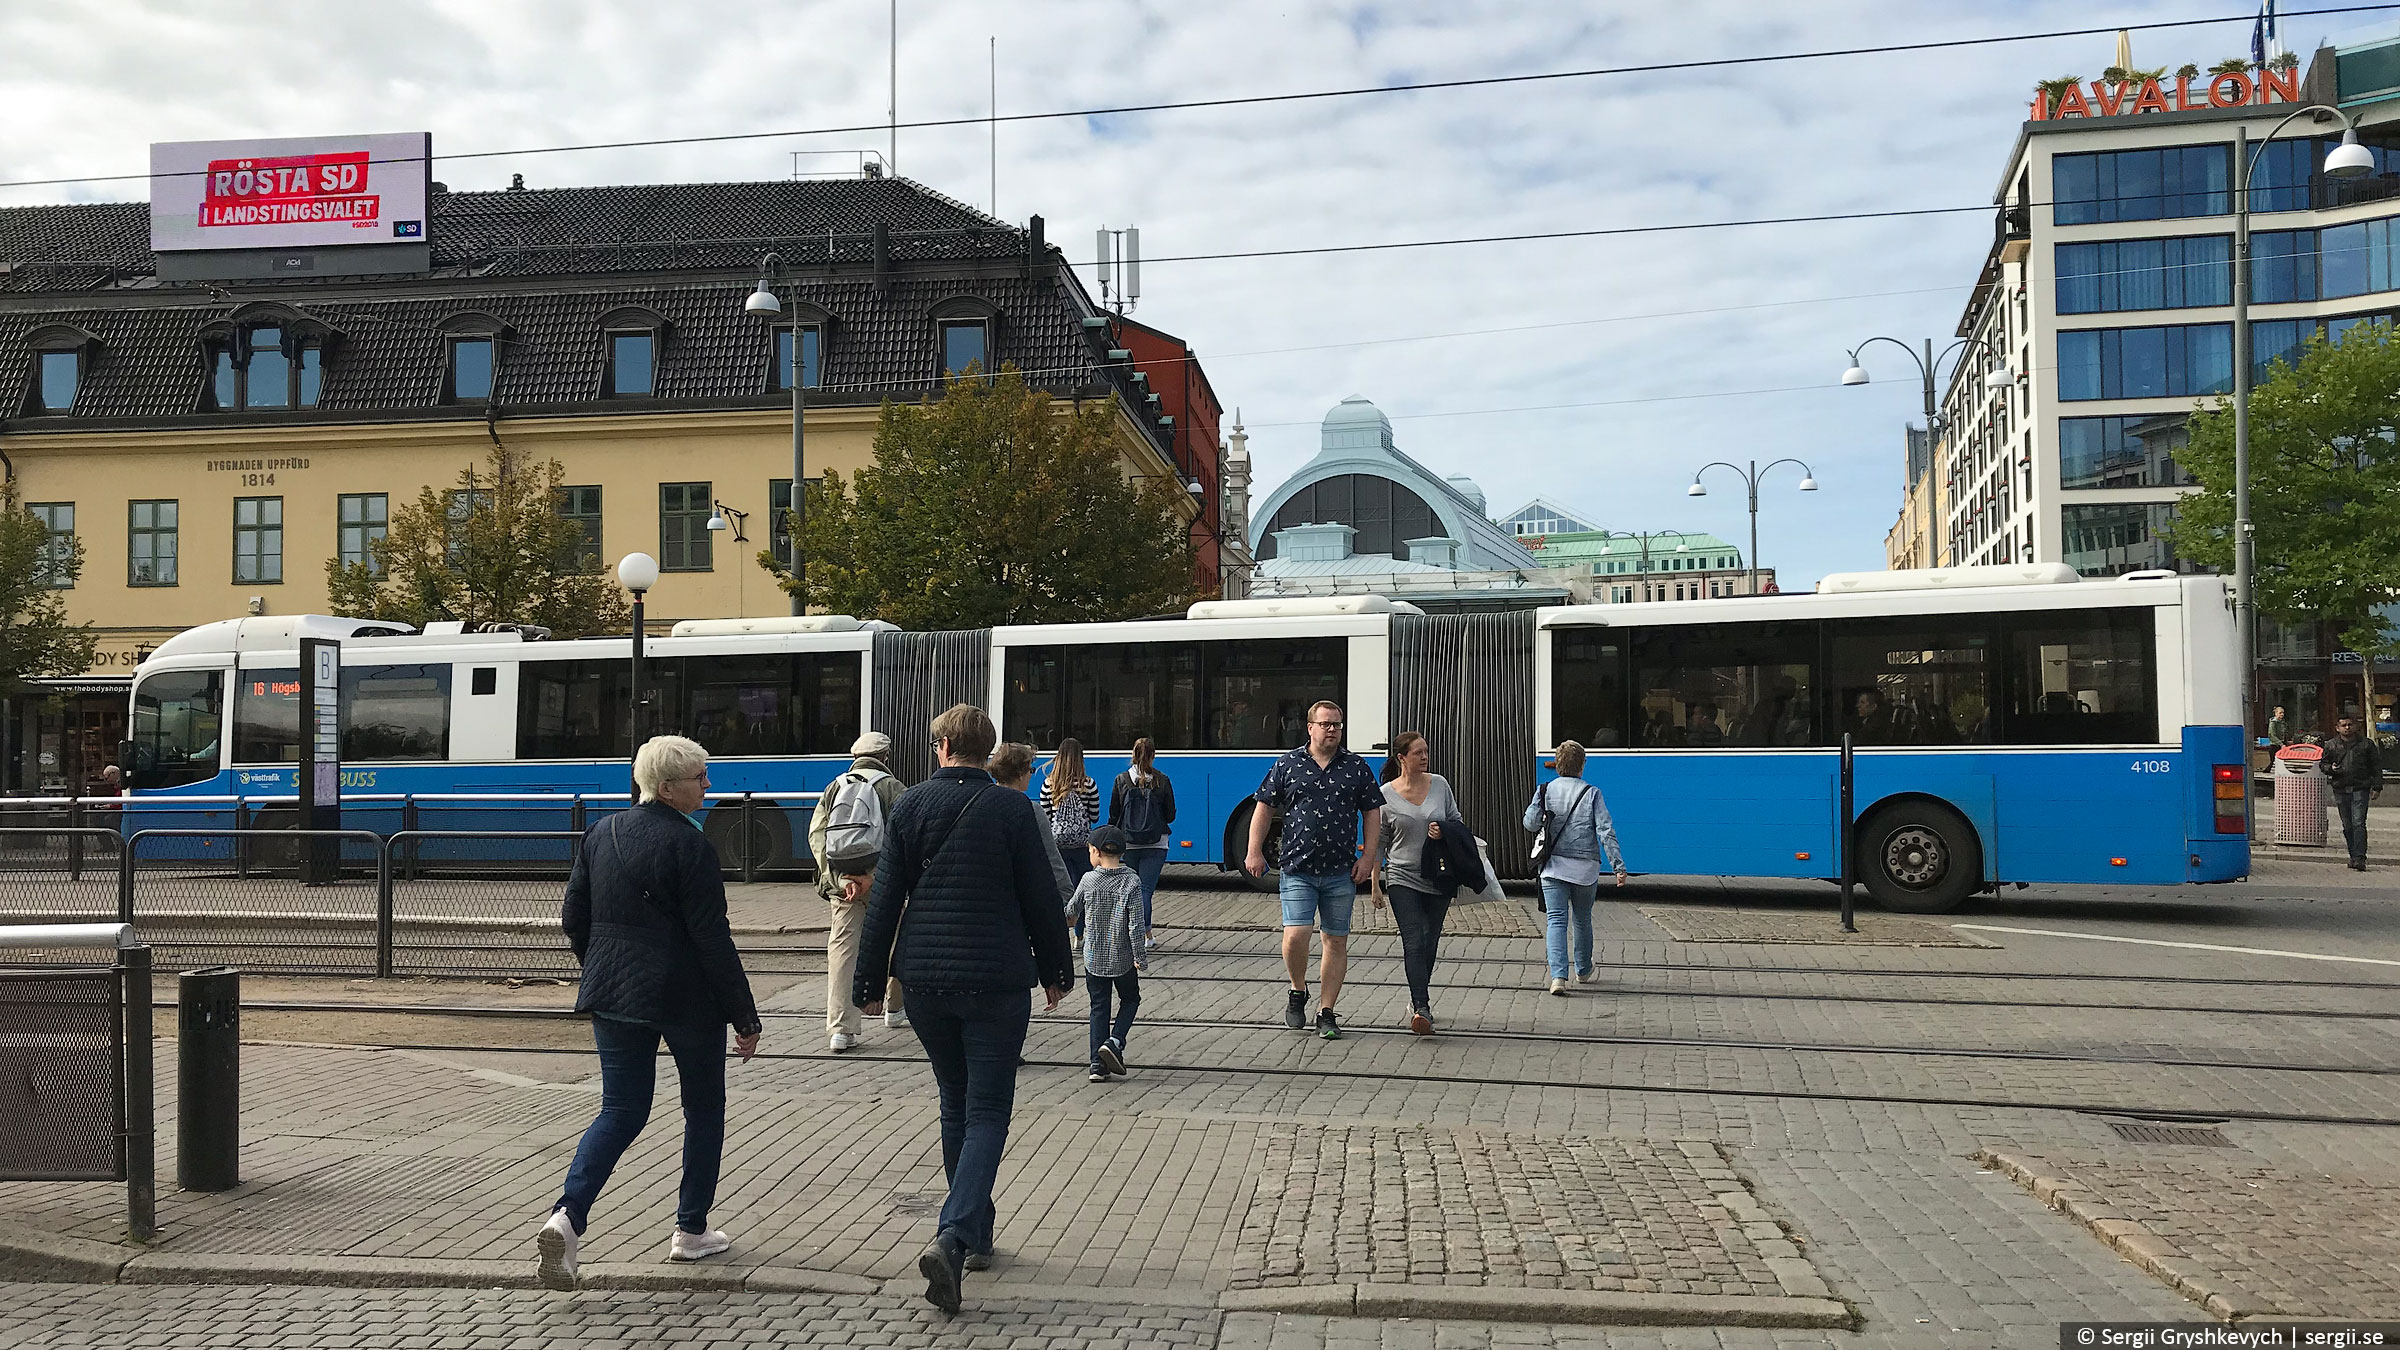 göteborg-ghotenburg-sweden-2018-11